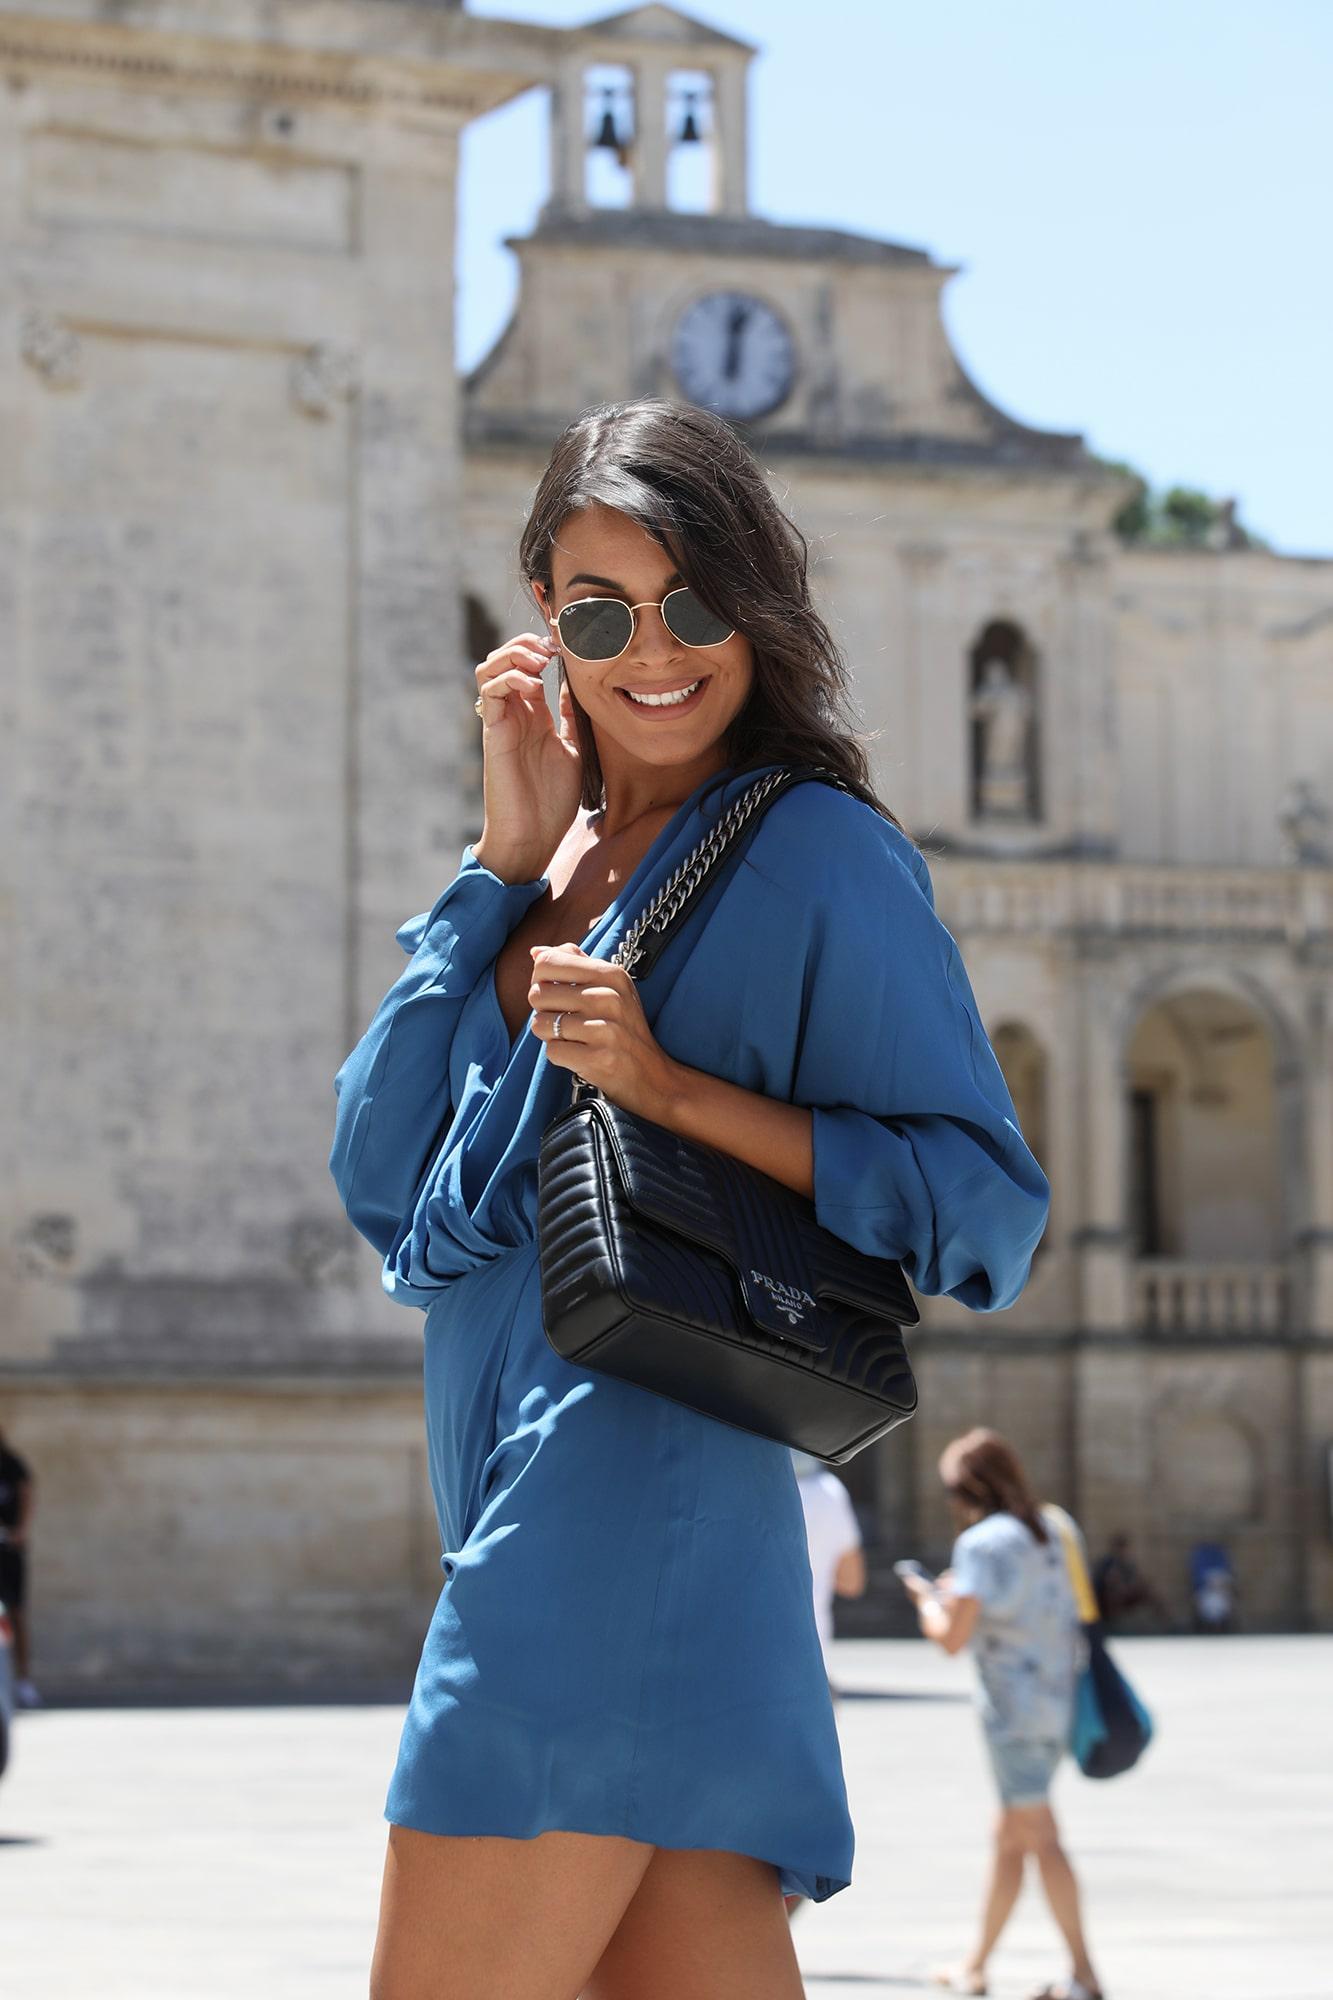 Adele Sammmartino - Shooting Piazza Duomo Lecce